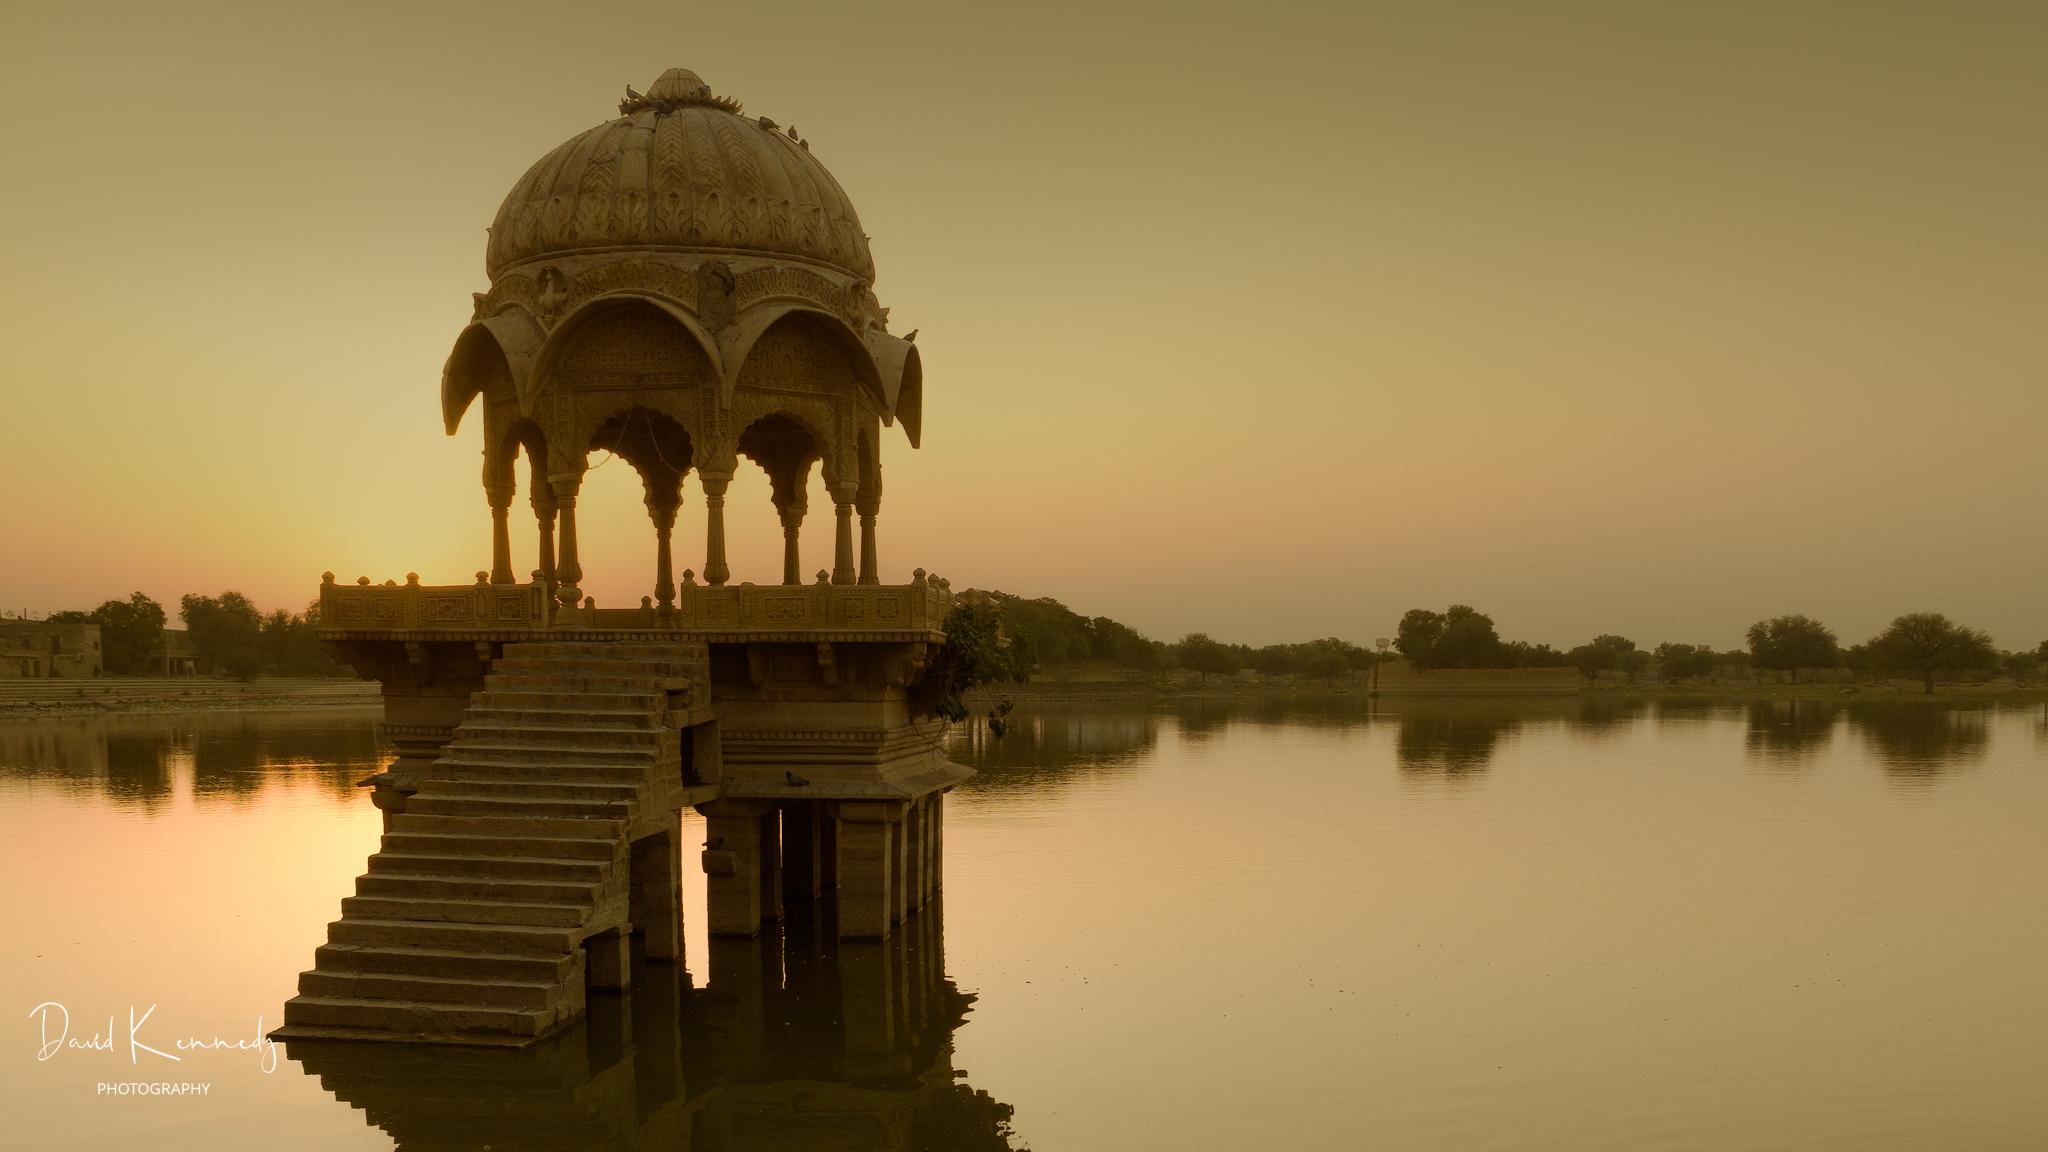 Ornate platform in Gadisar Lake in India at Sunrise